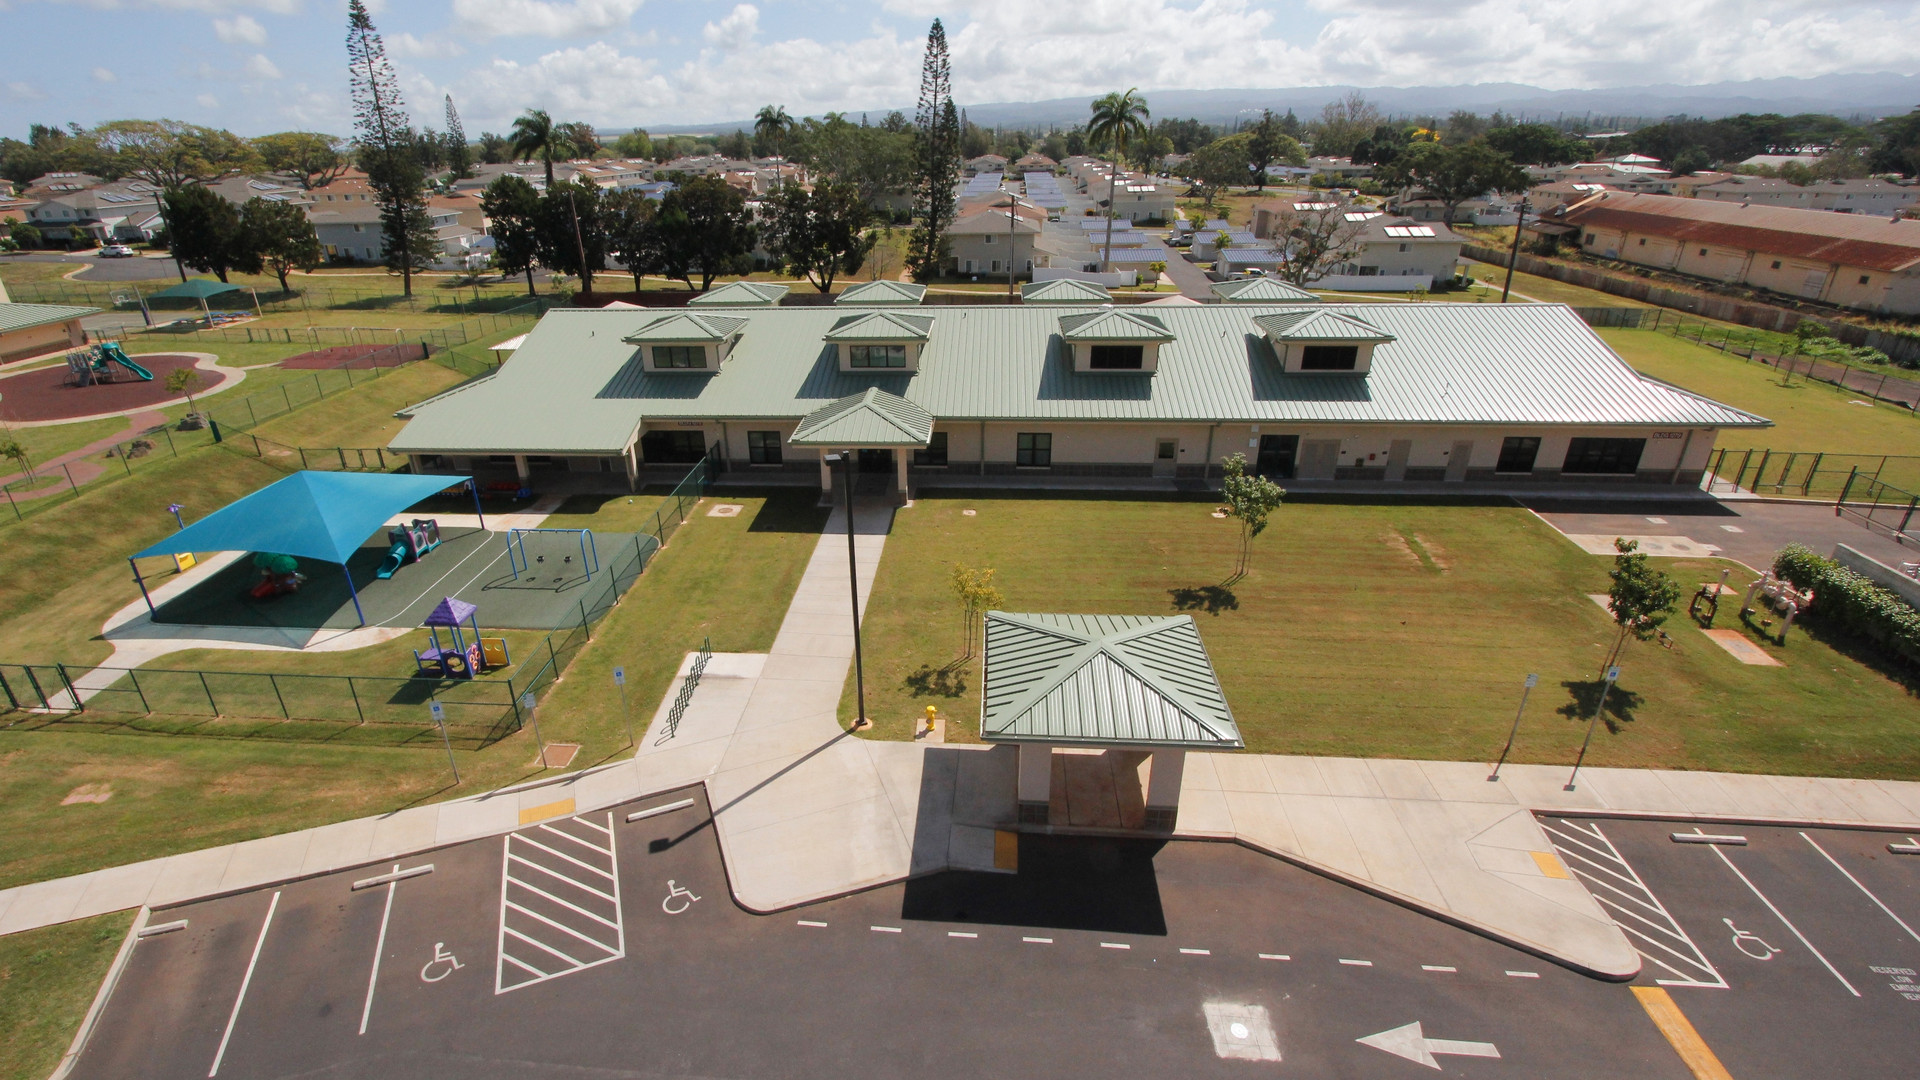 Child Development Center, Schofield Barracks